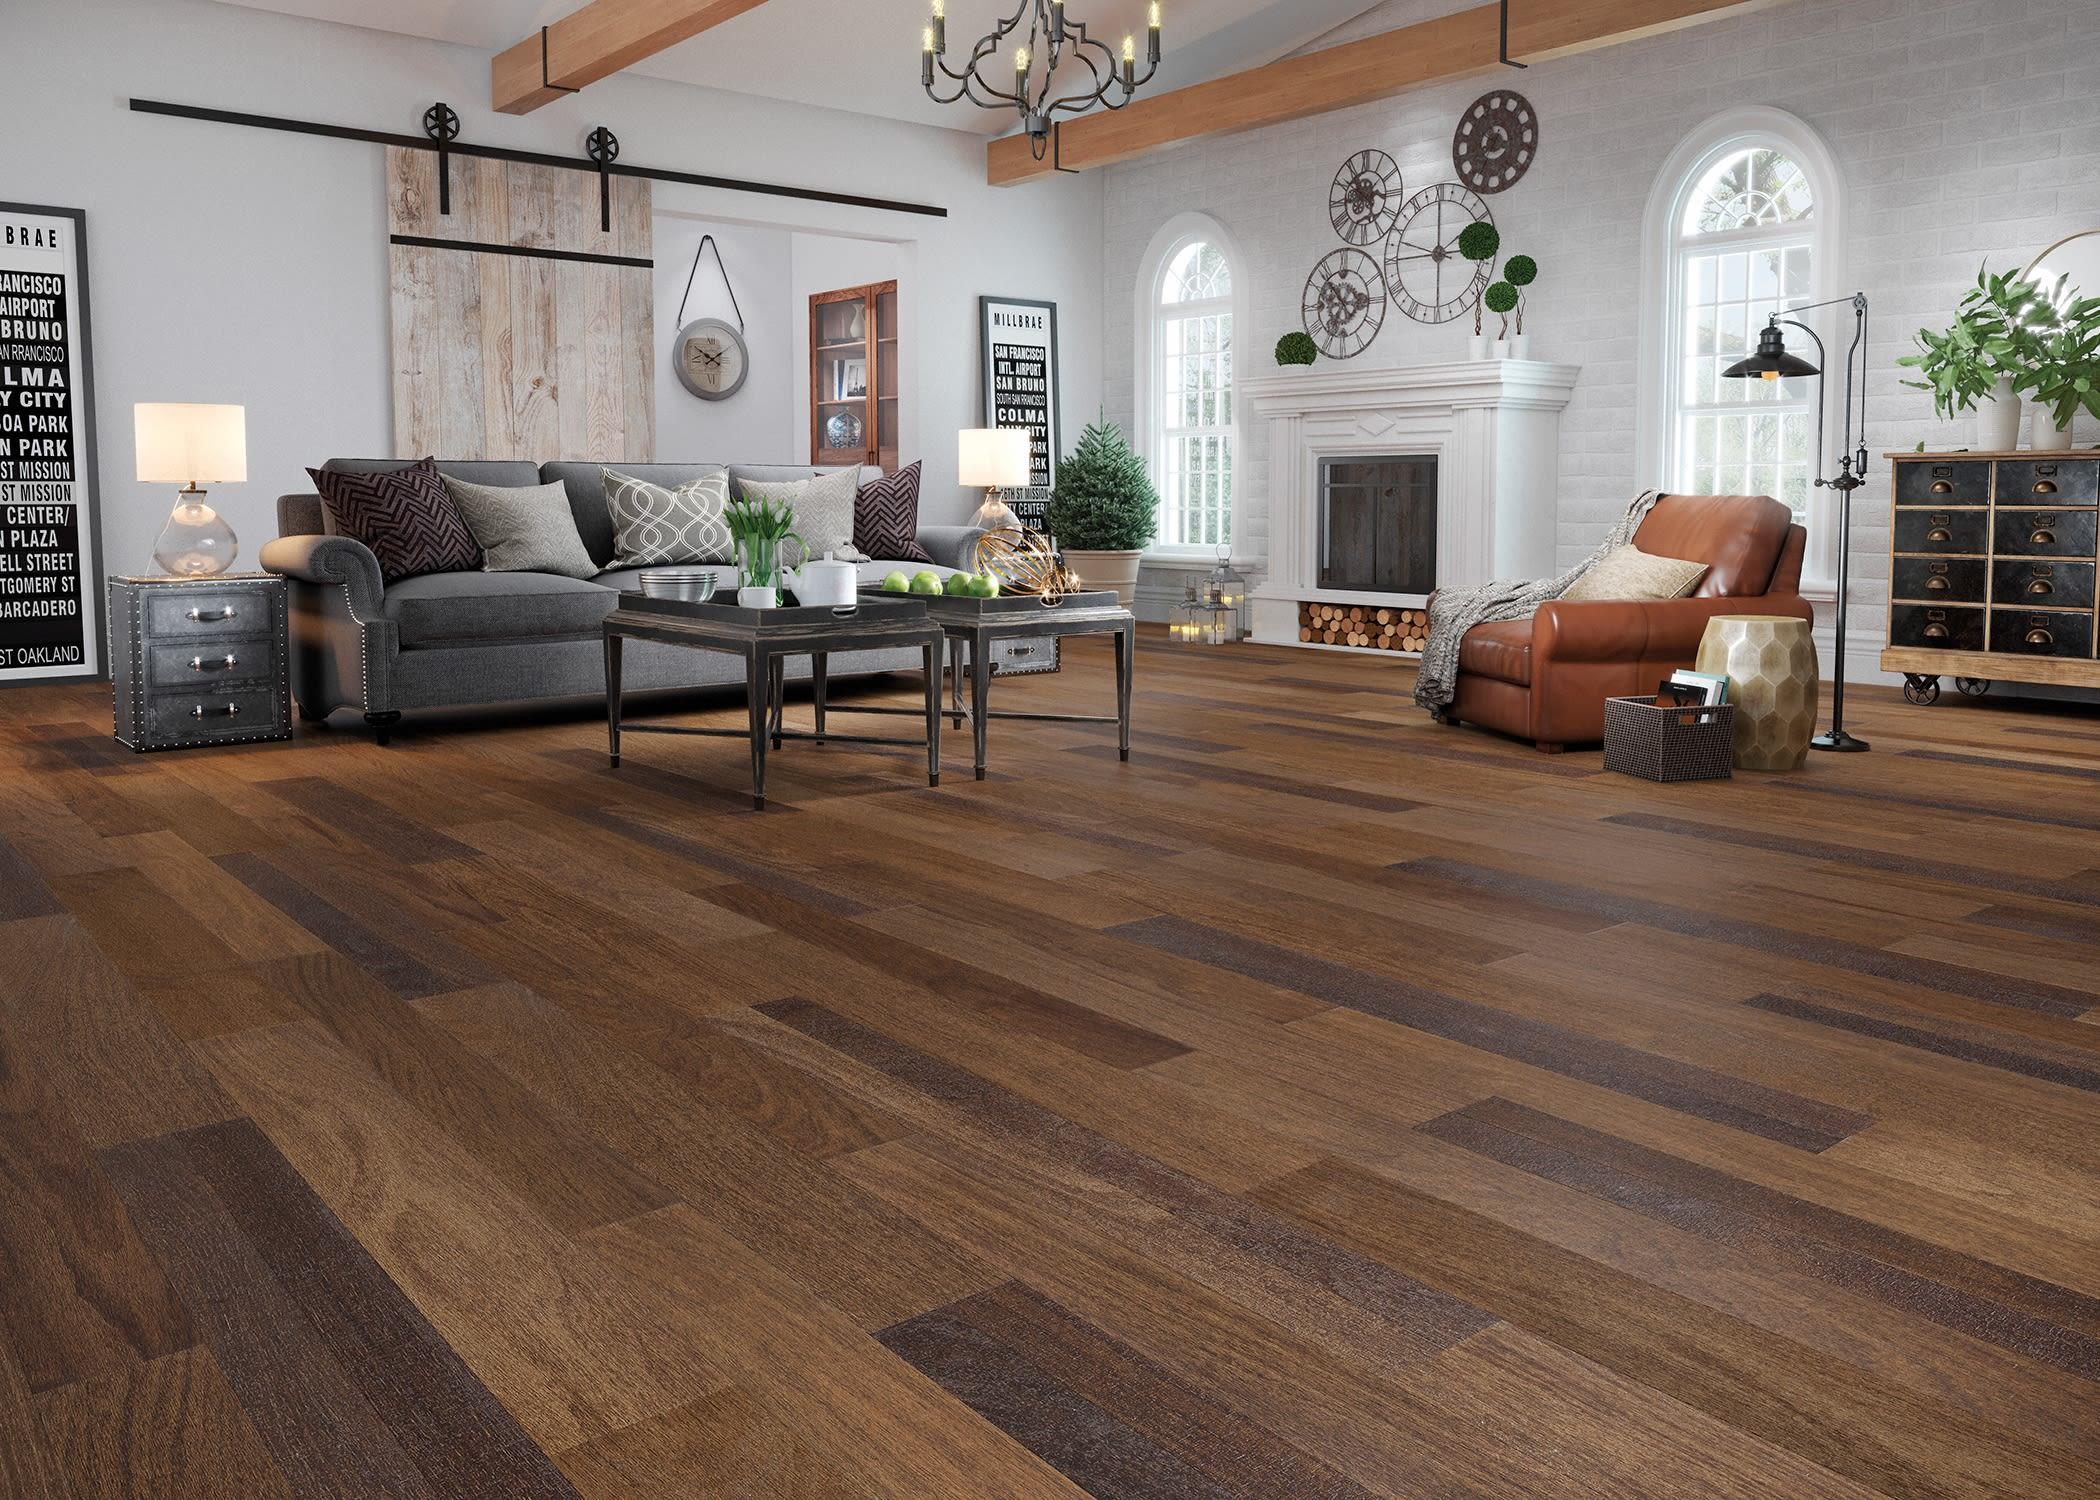 Floor Finder Tool Ll Flooring Lumber, Installing Laminate Flooring Lumber Liquidators